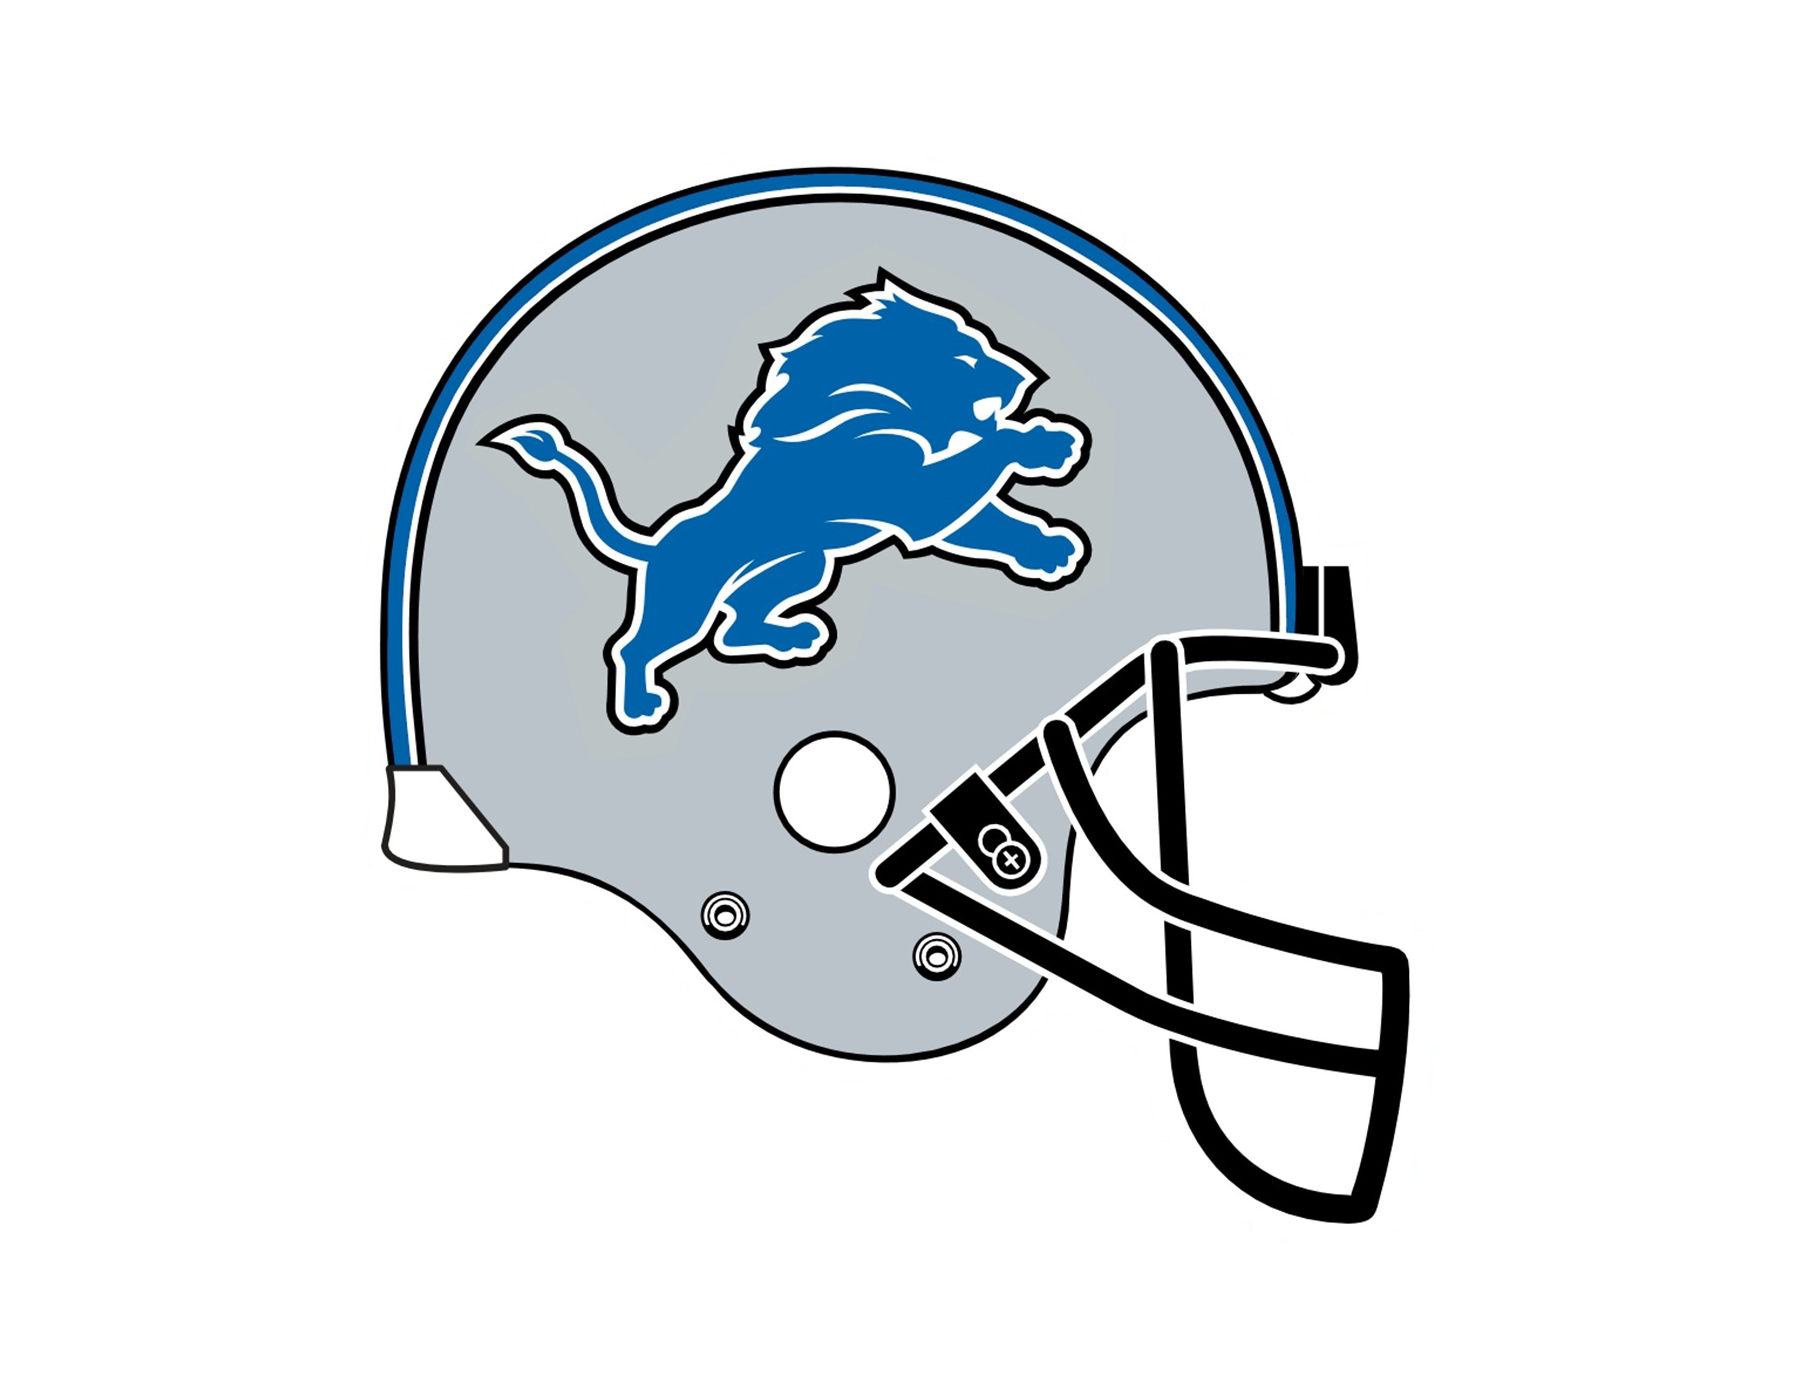 Detroit Lions Ford Field NFL American Football Helmets.